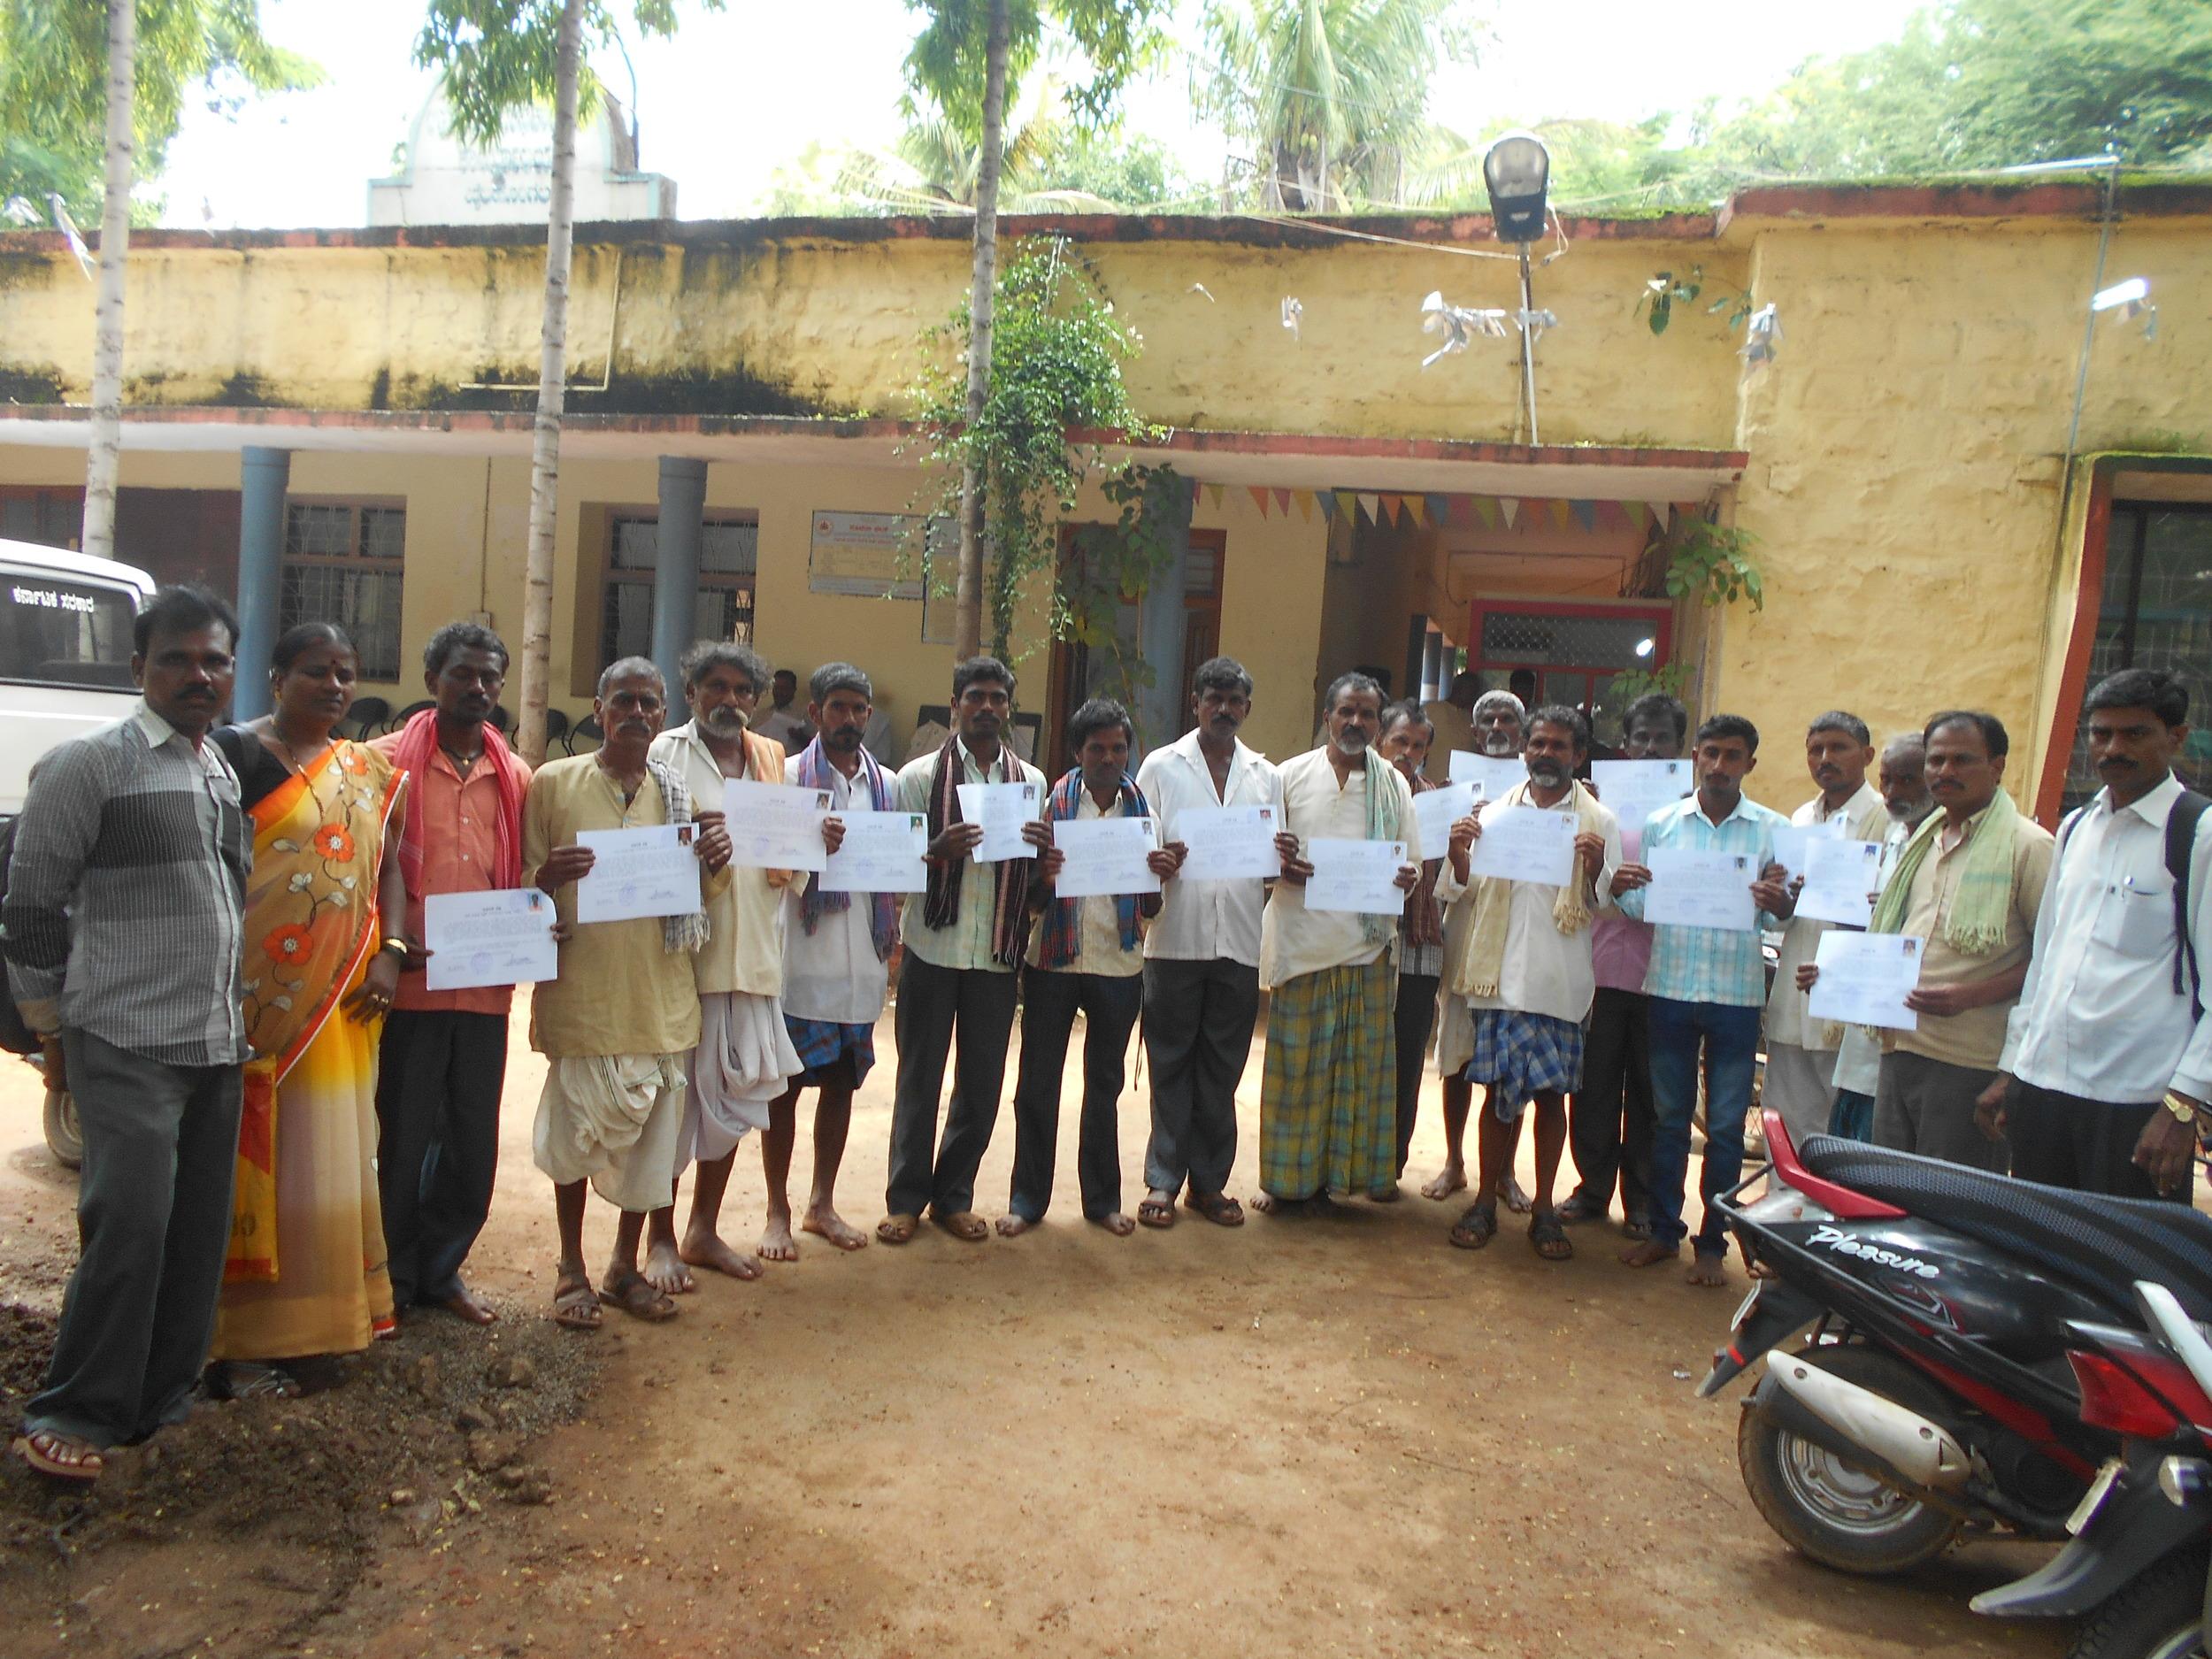 Jeevika Free (India)